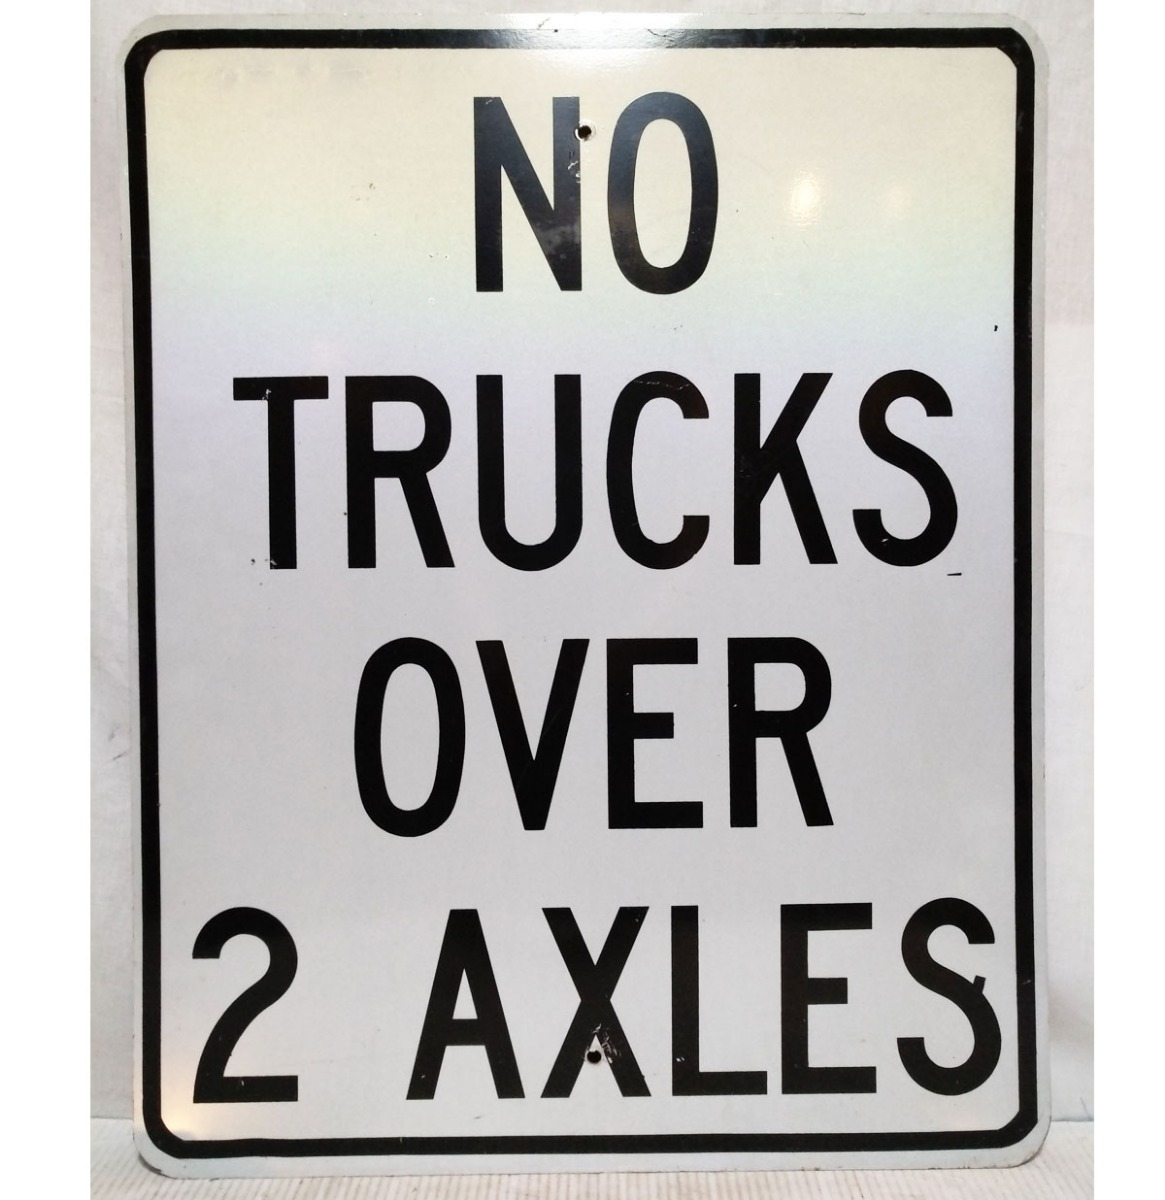 No Trucks Over 2 Axles Street Sign - Original